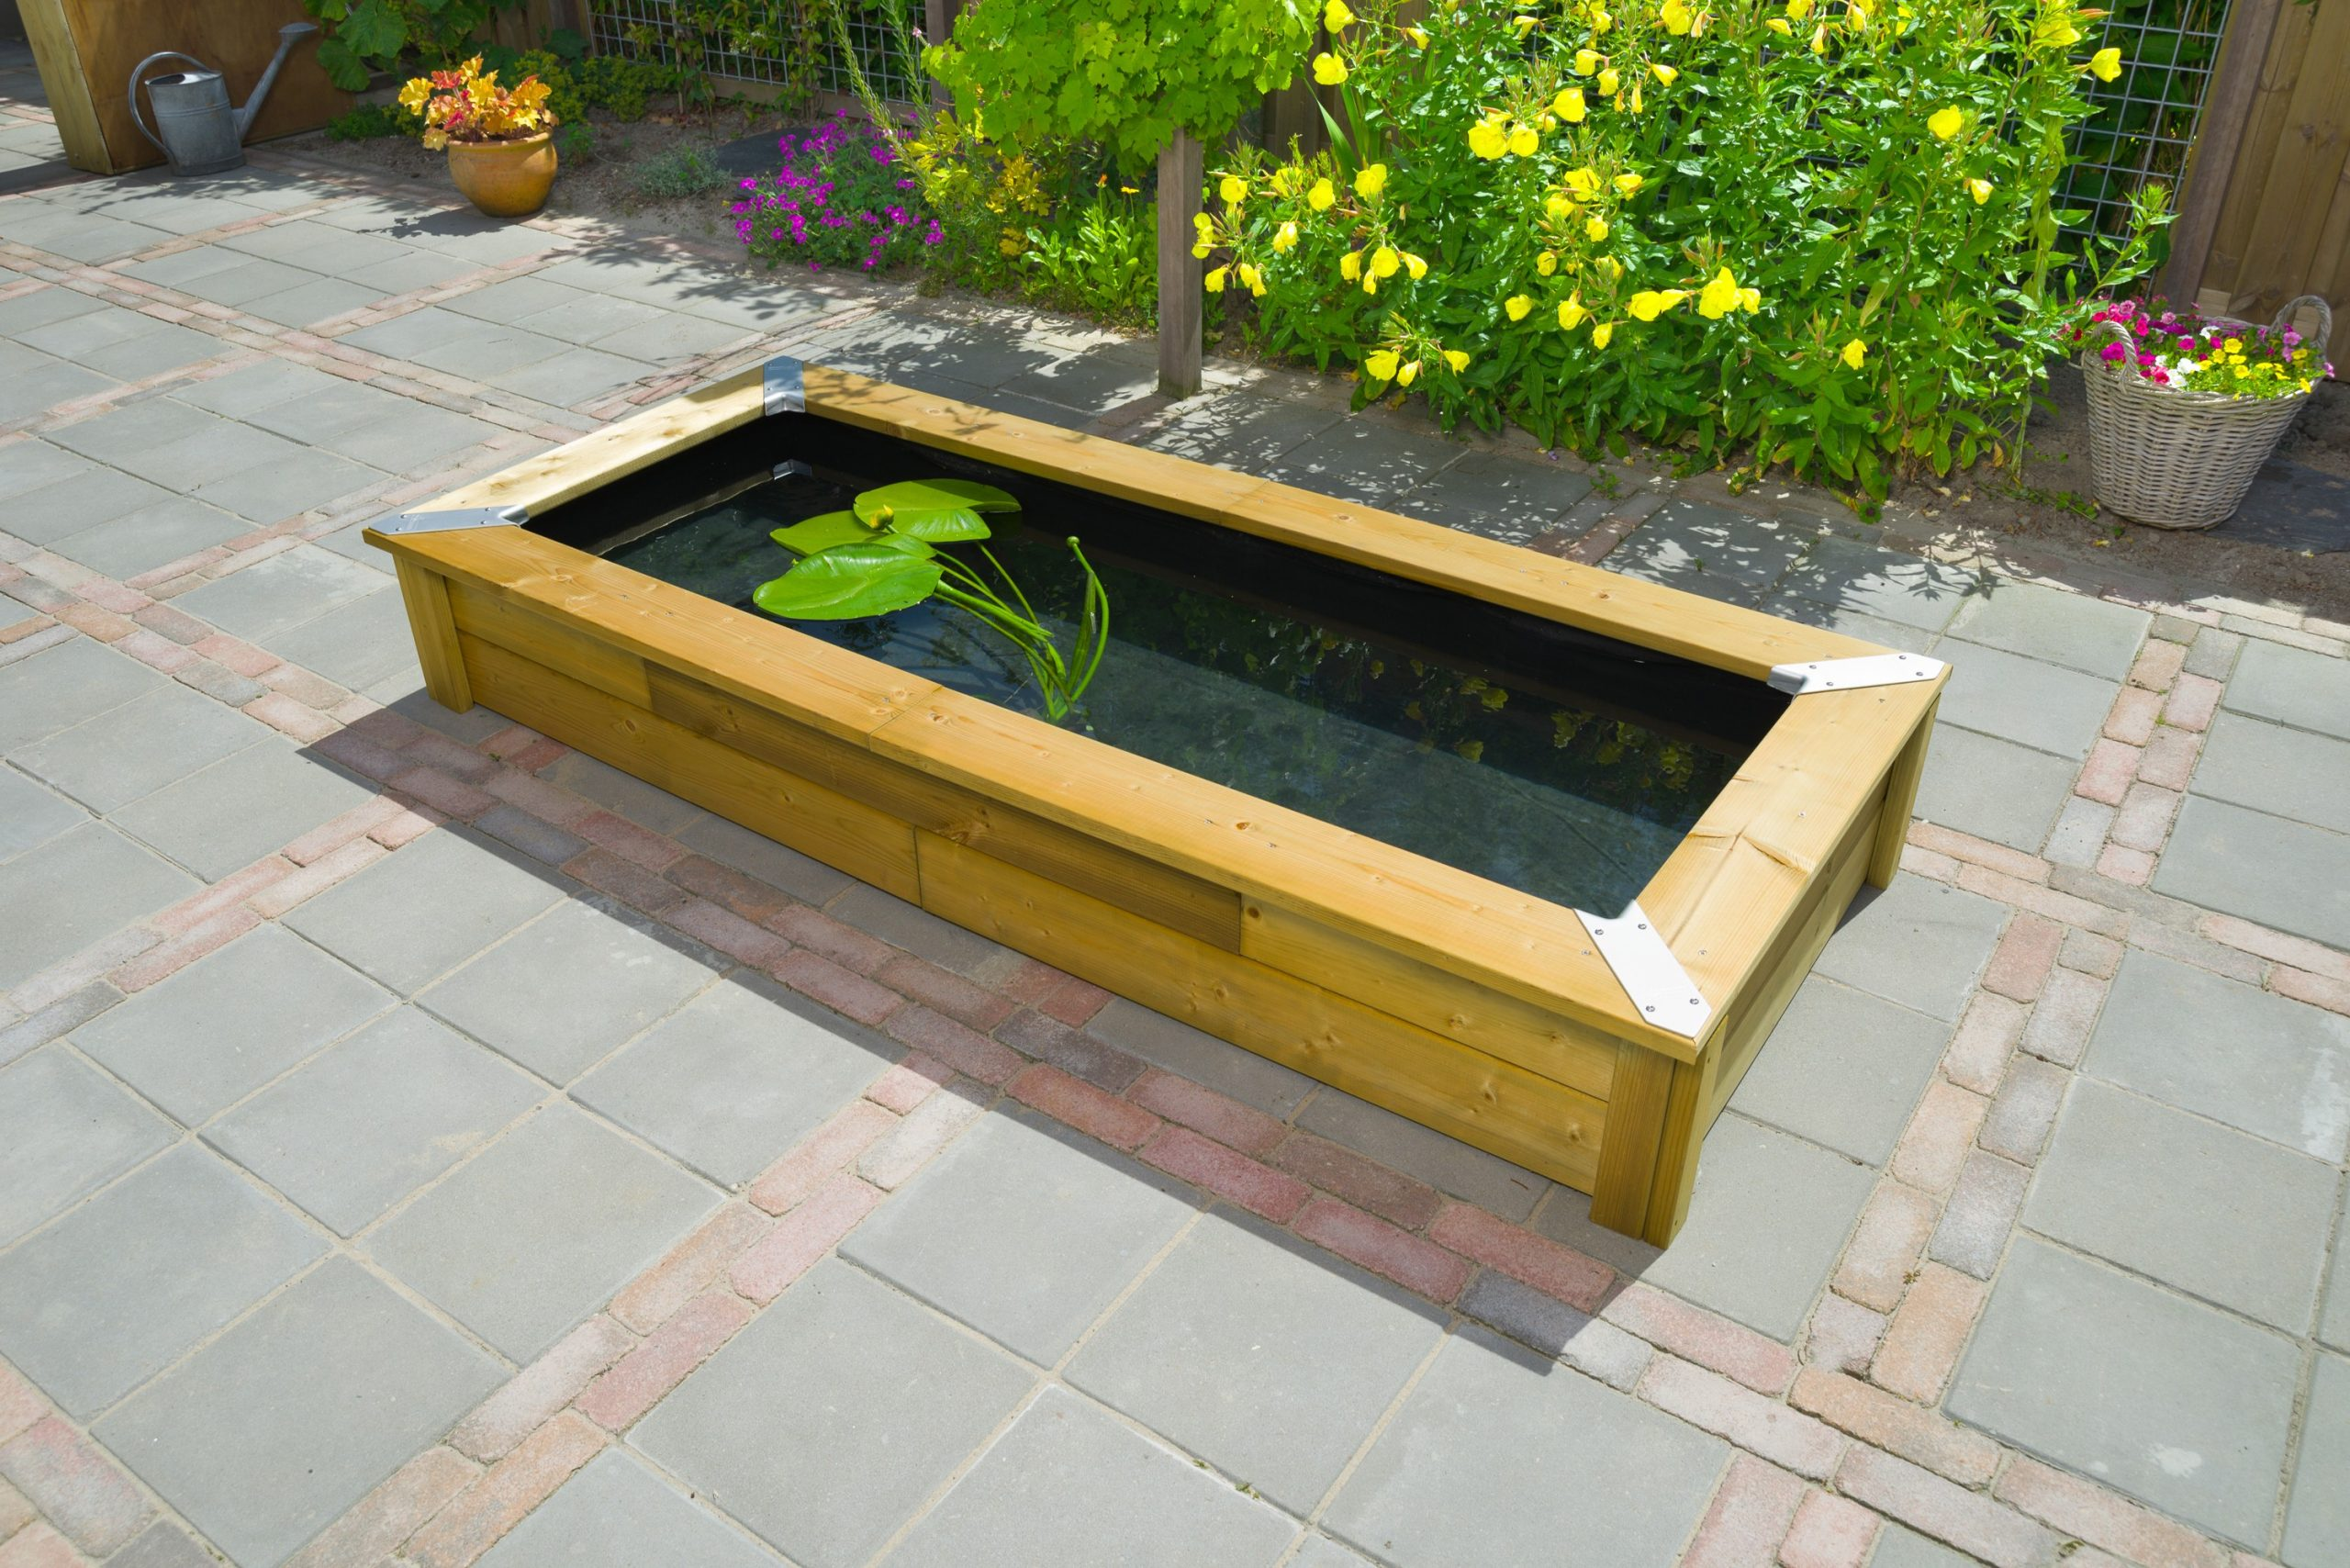 Kit Bassin De Jardin En Bois Avec Bâche Set Quadro Wood 5 Ubbink concernant Kit Bassin Jardin